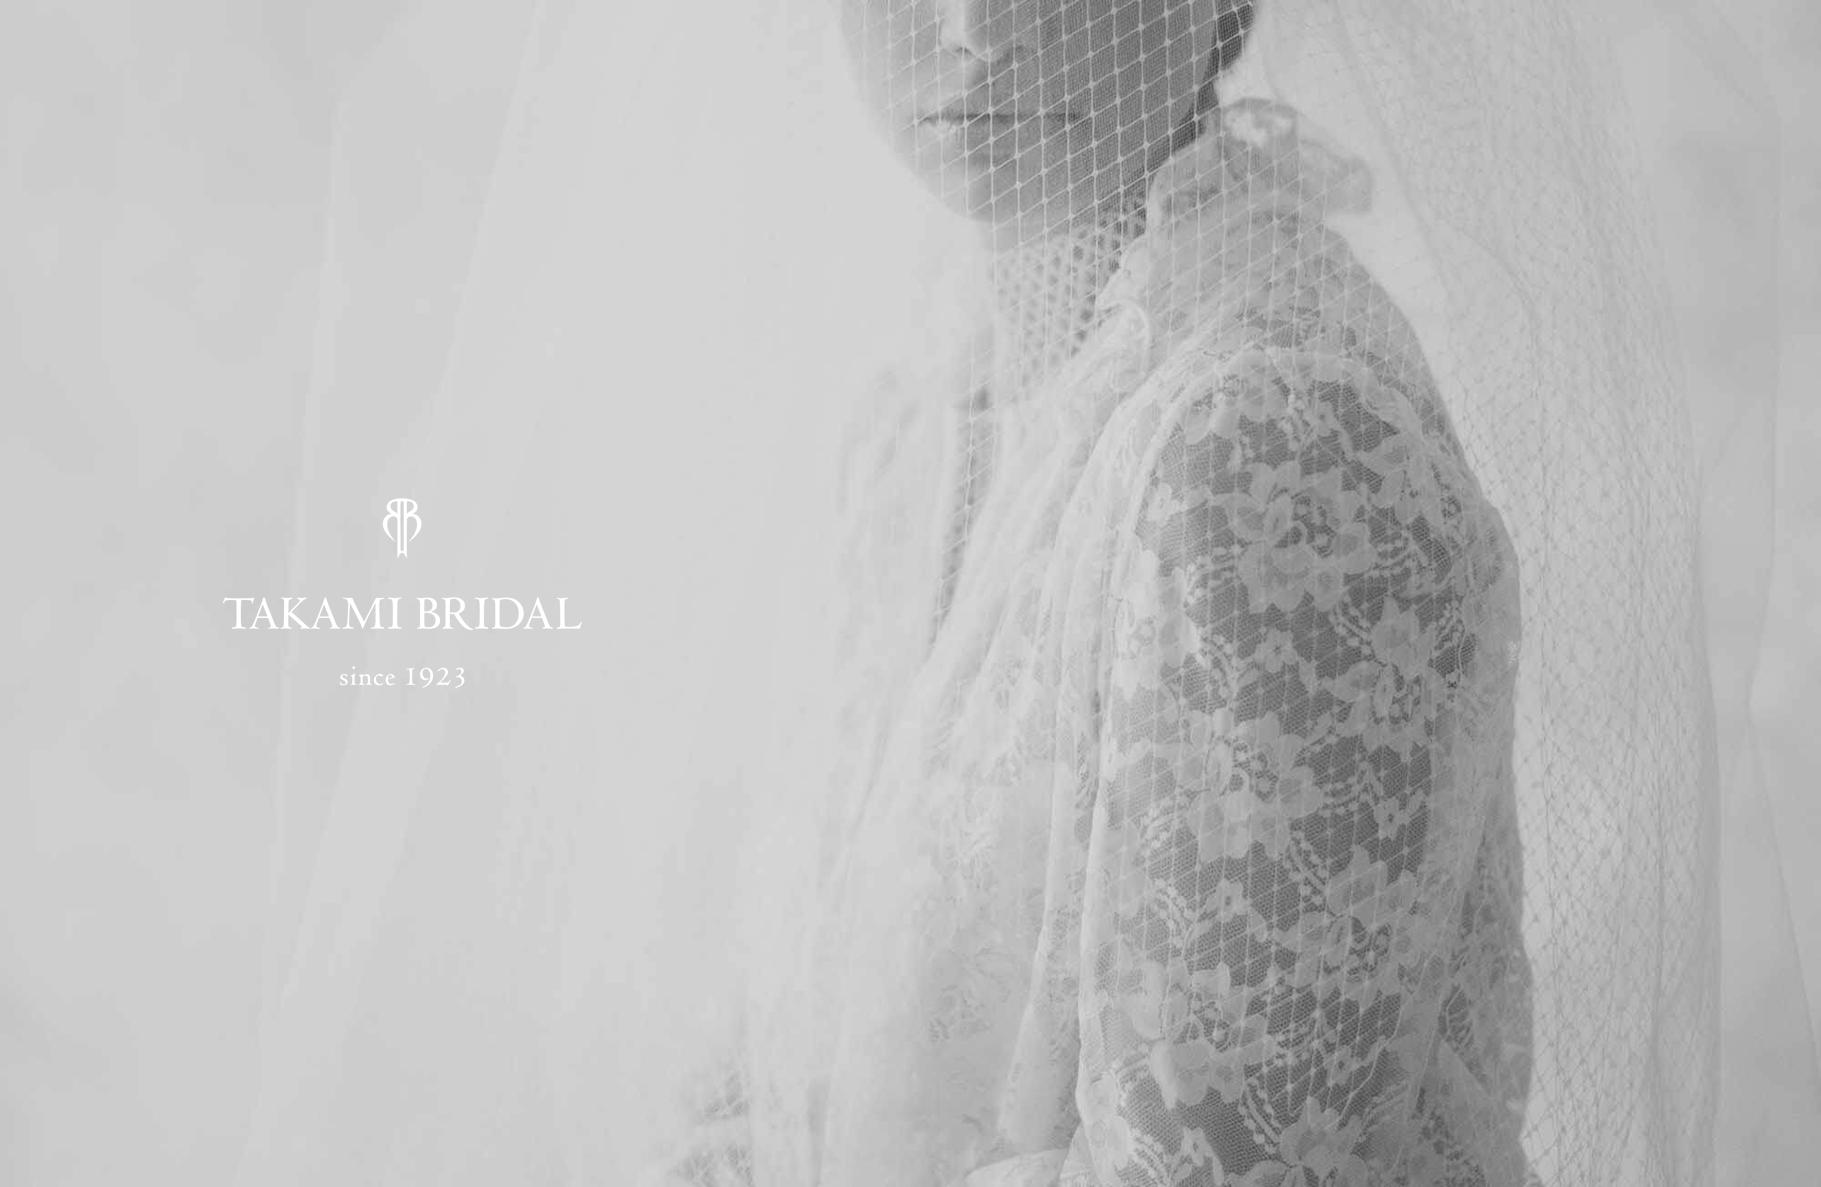 TAKAMI BRIDAL(高見(株))